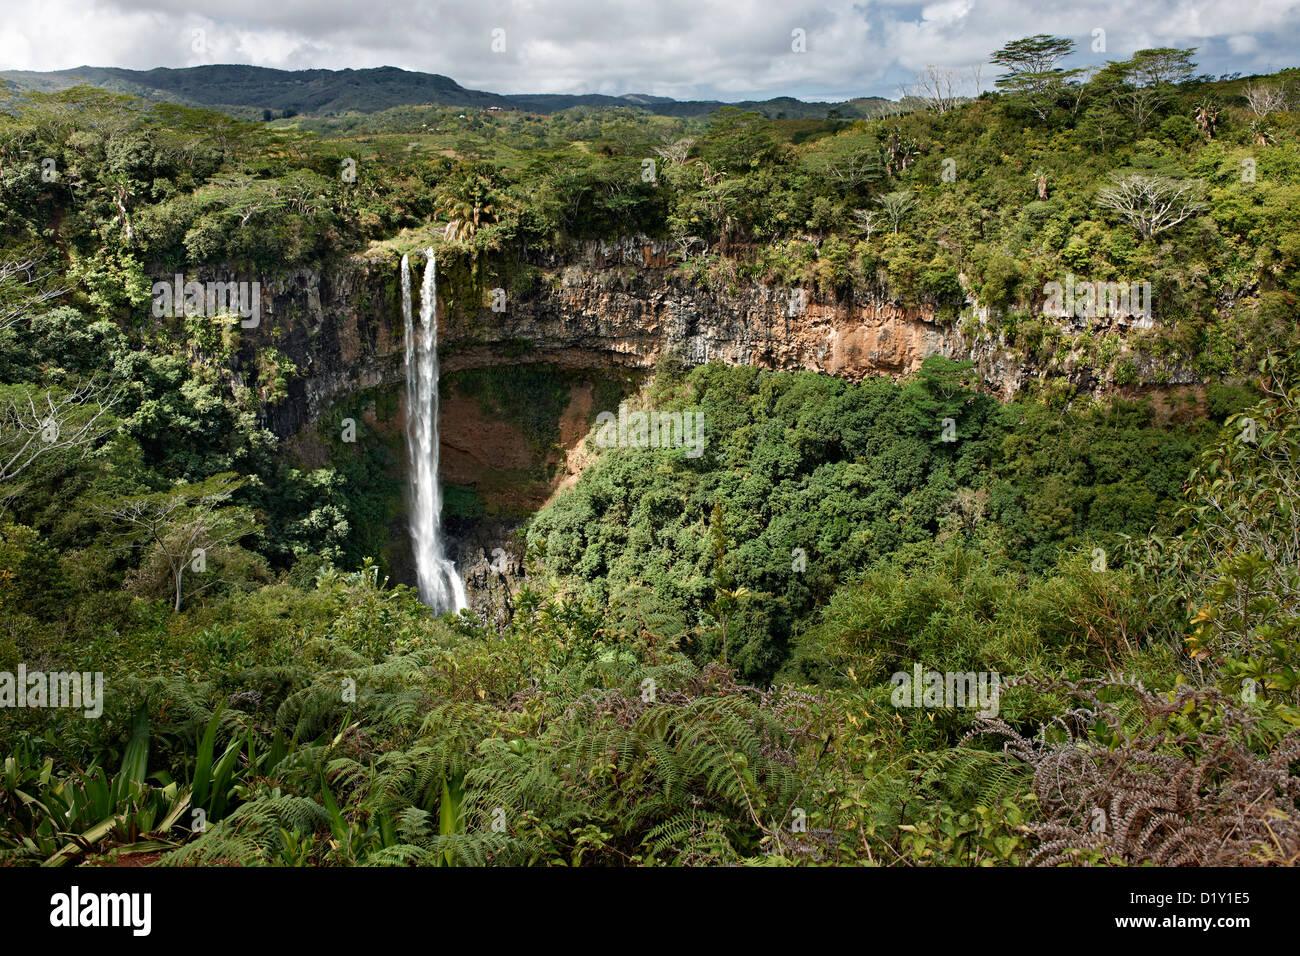 Chamarel Falls, Chamarel, Mauritius, Indian Ocean, Africa - Stock Image